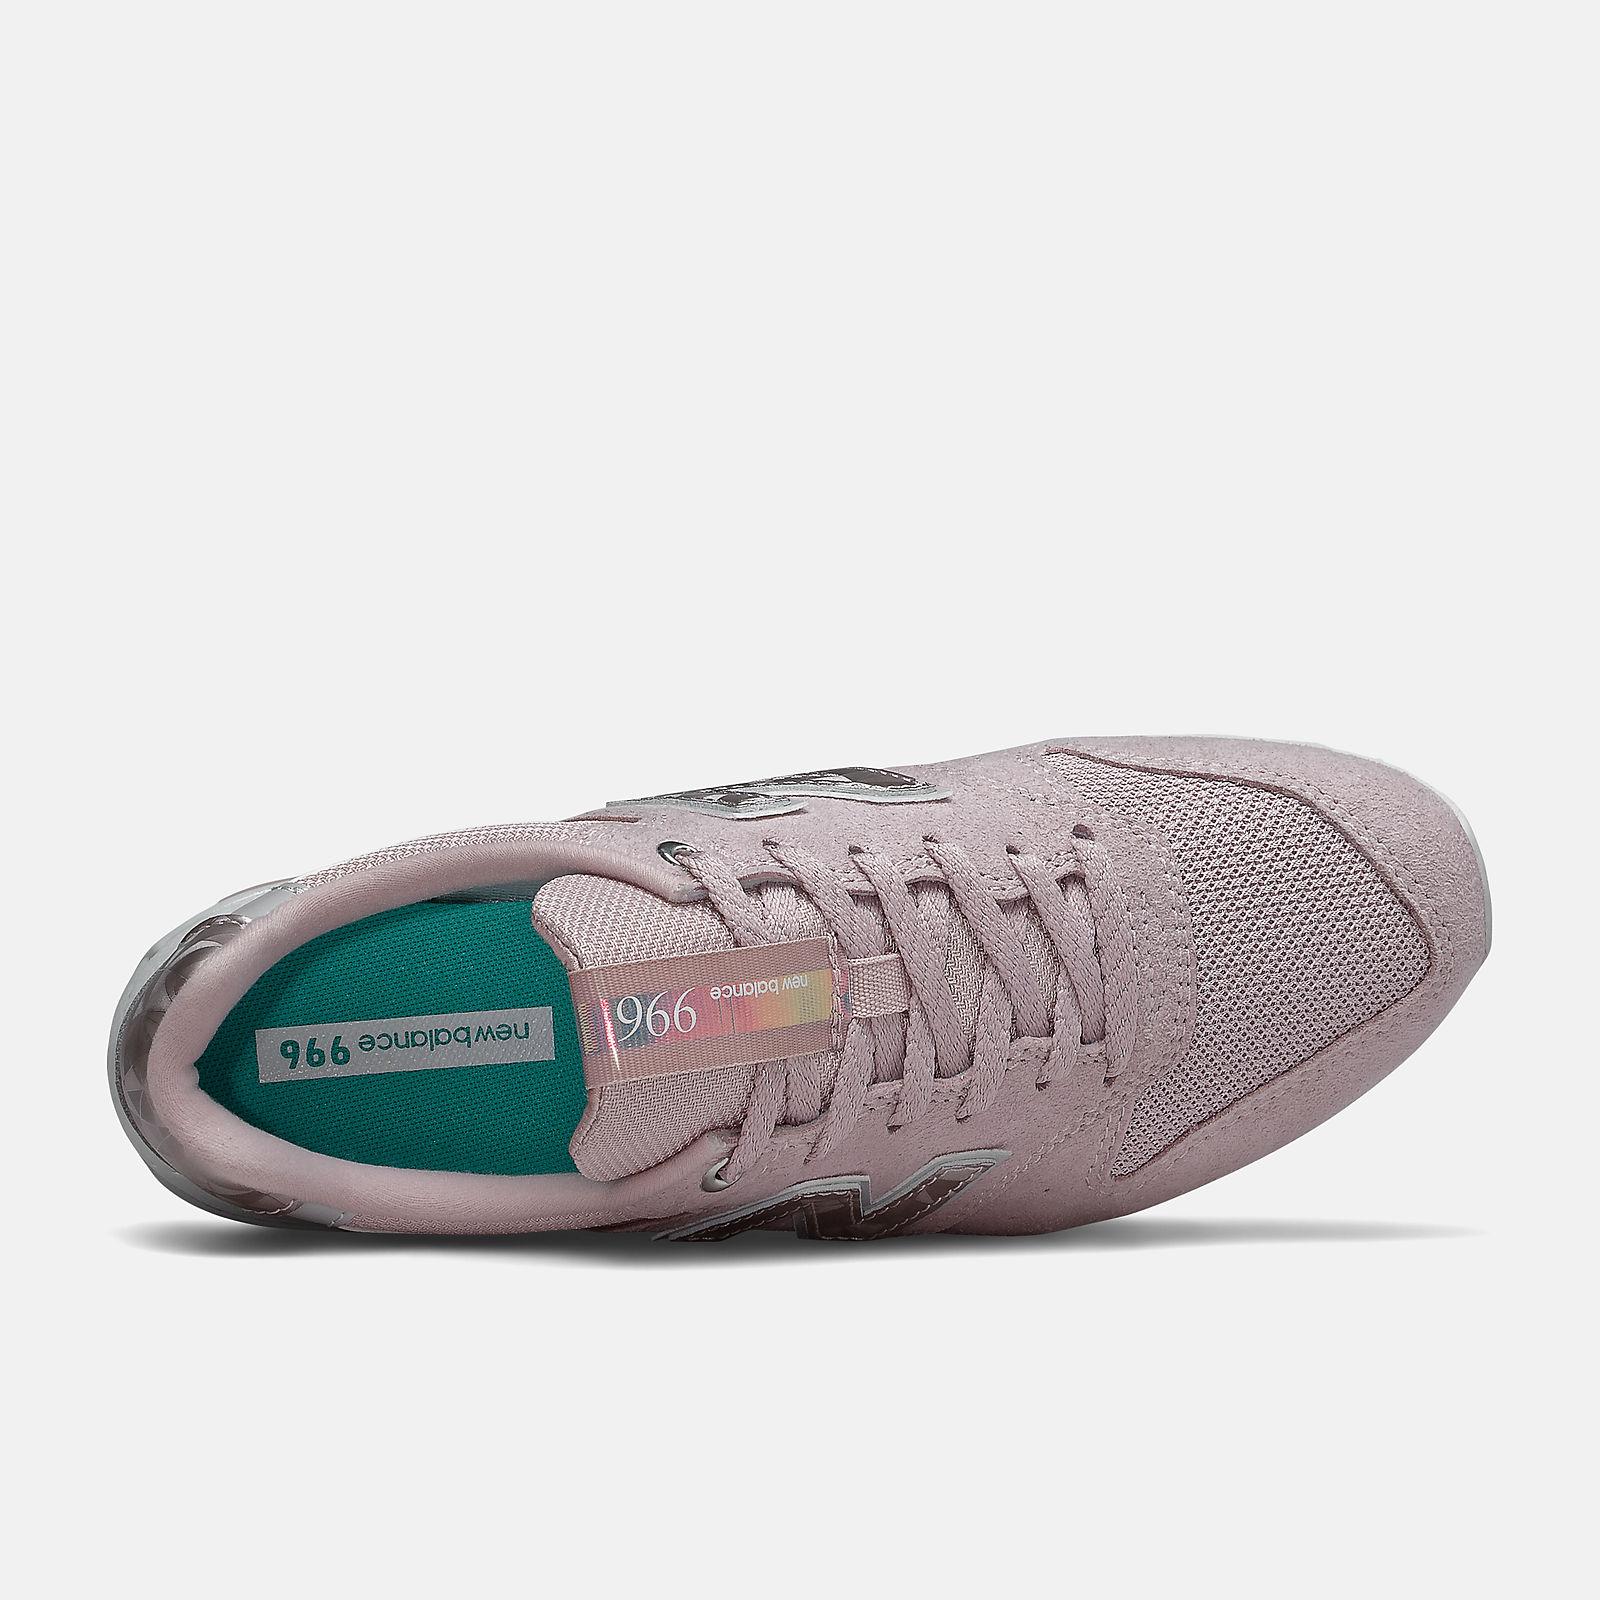 new balance 996 gris y rosa